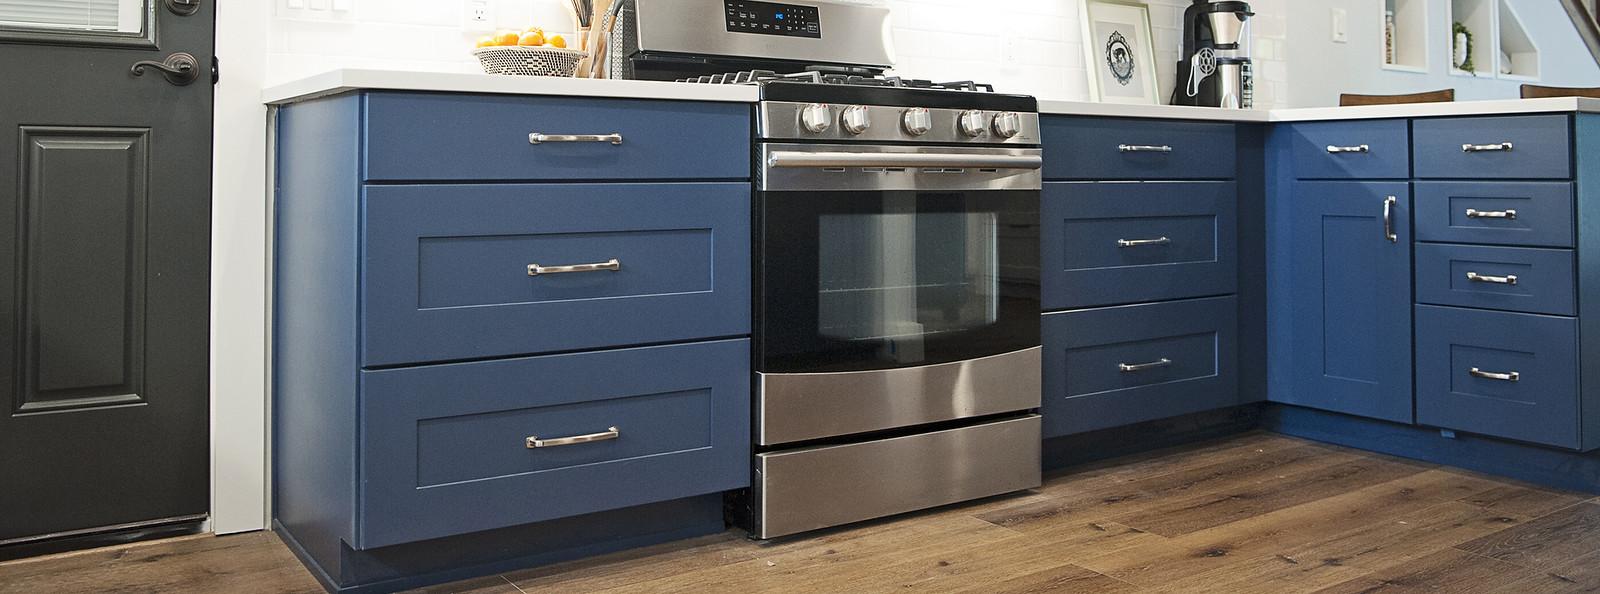 Wolf Designer Cabinets in Custom Blue